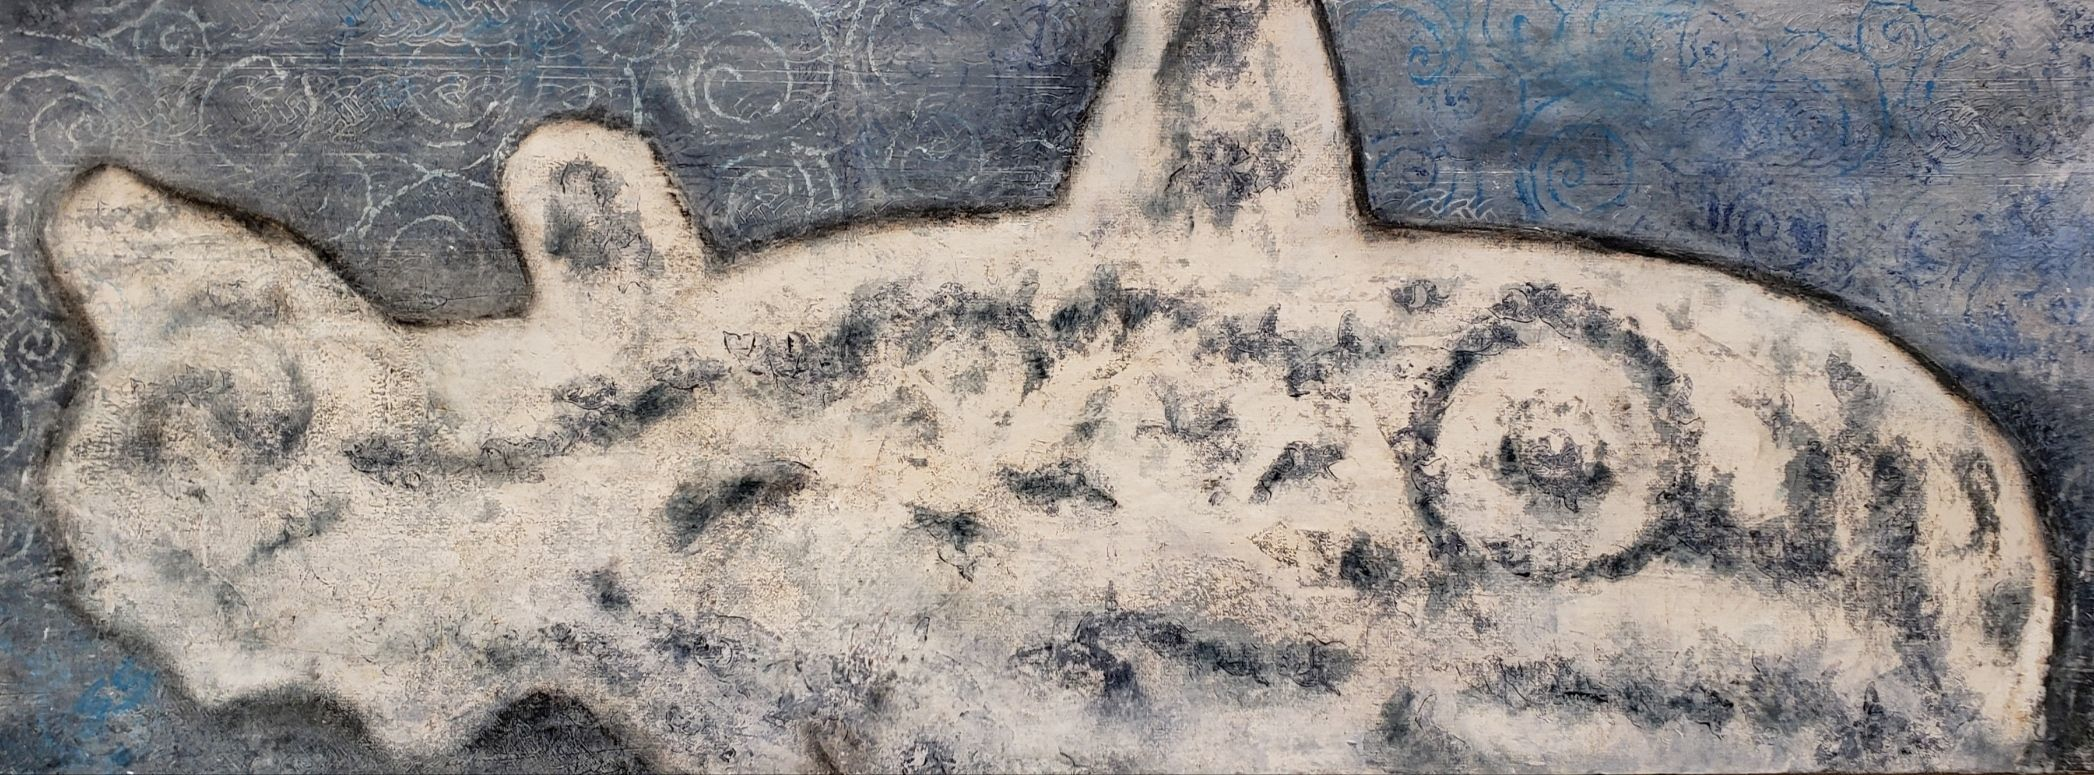 "Sandy Shepard - ""Wrangell Whale Petroglyph"""